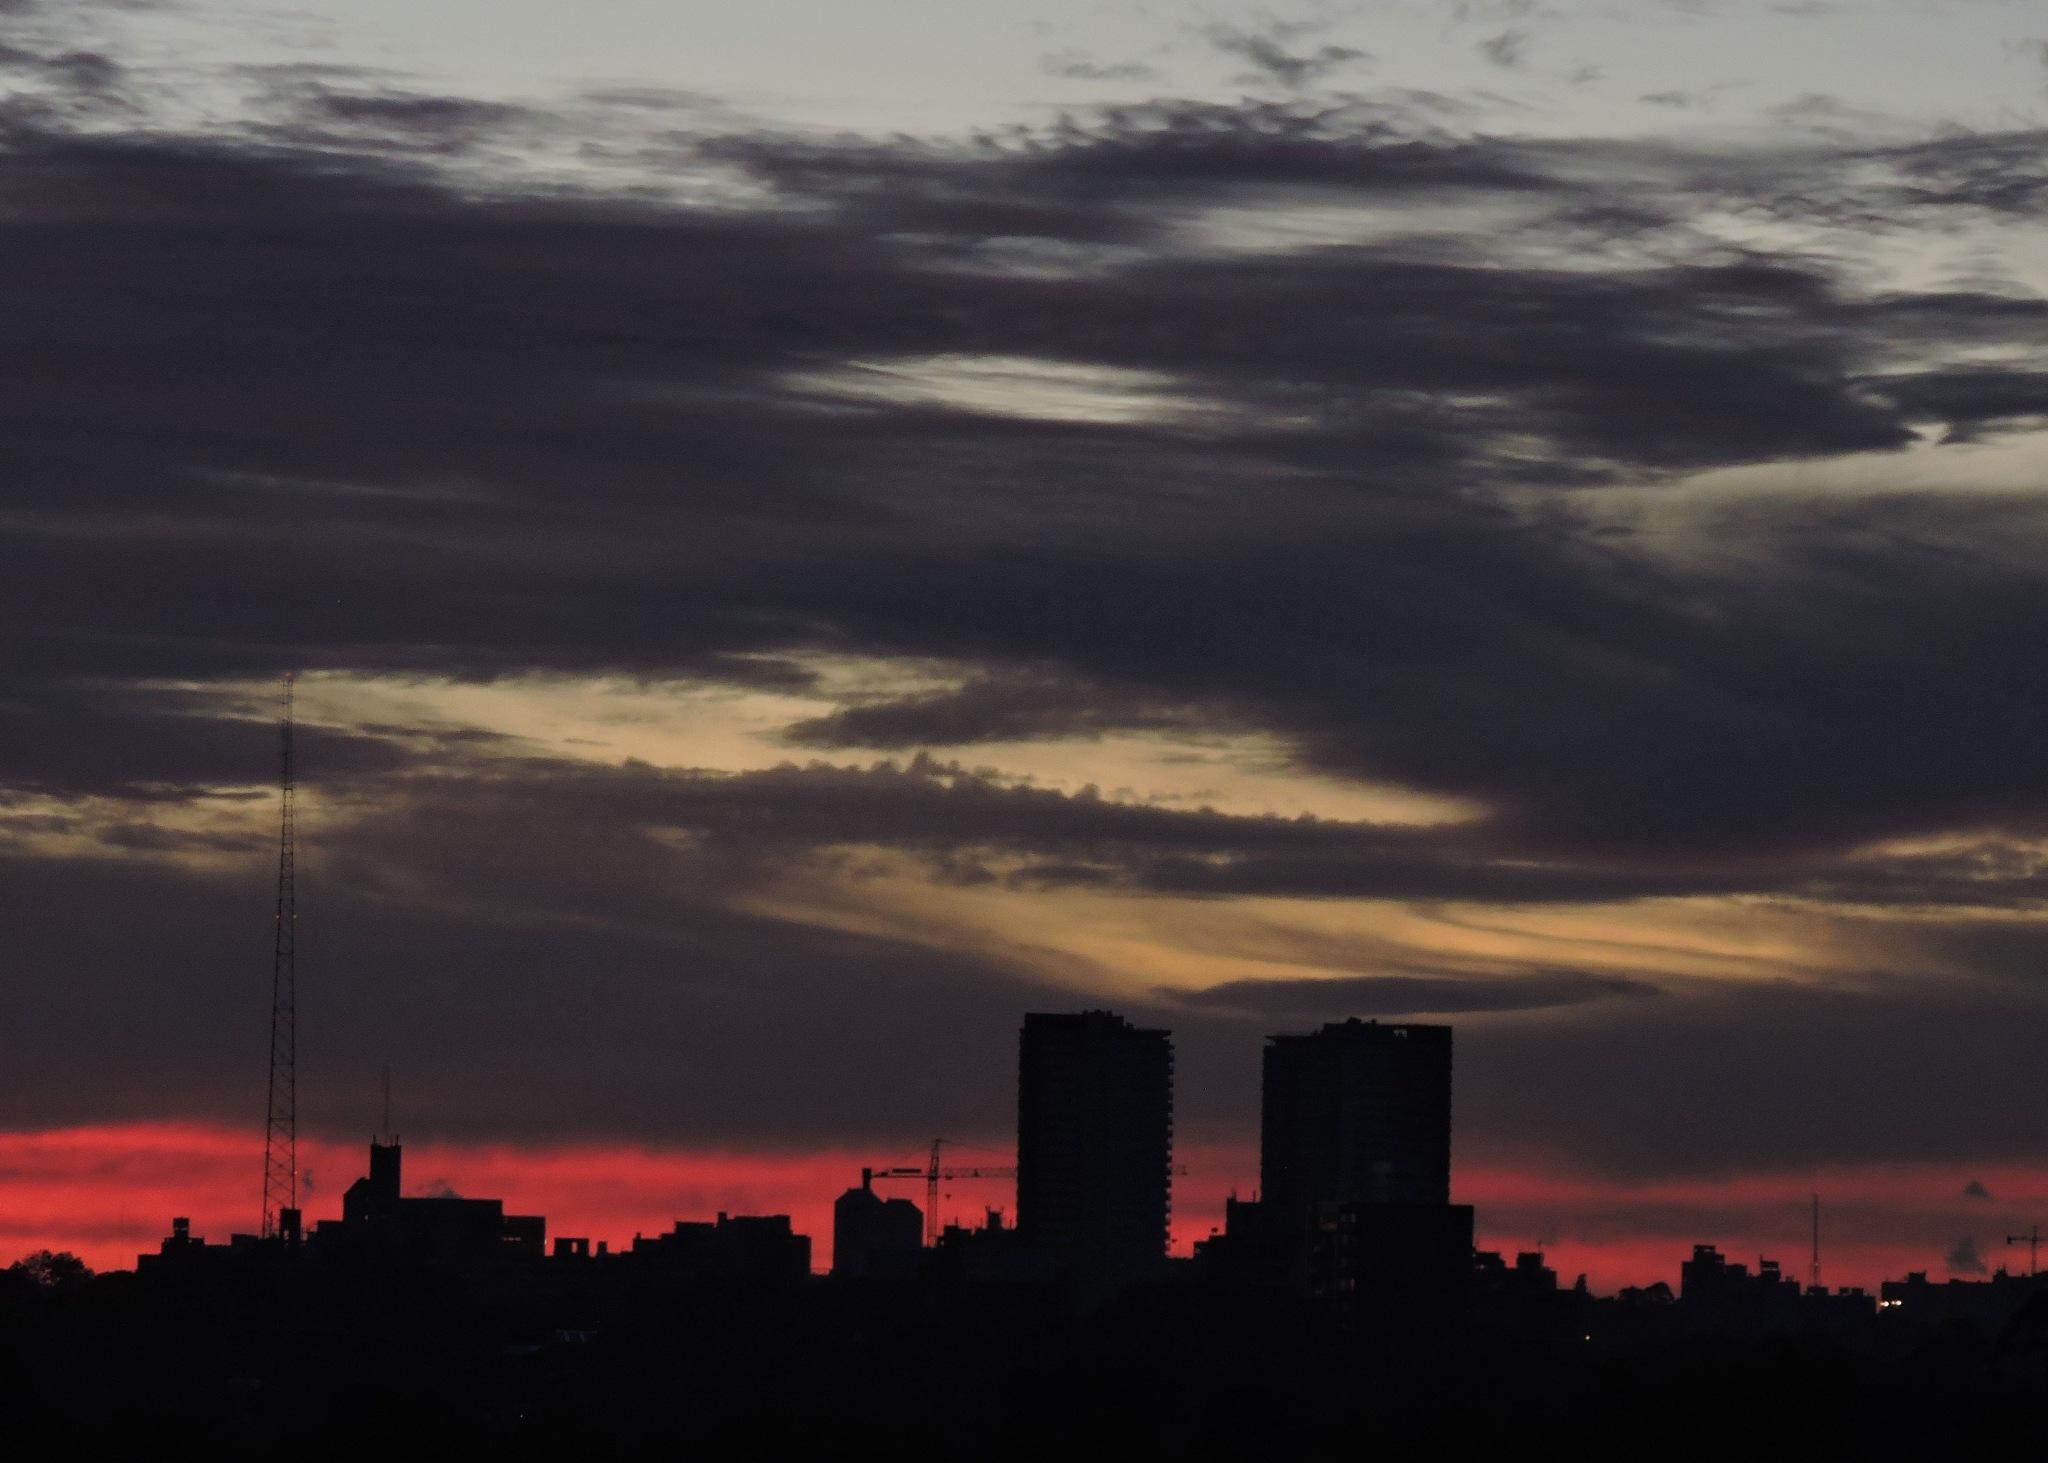 Sunrise by Katya Prt